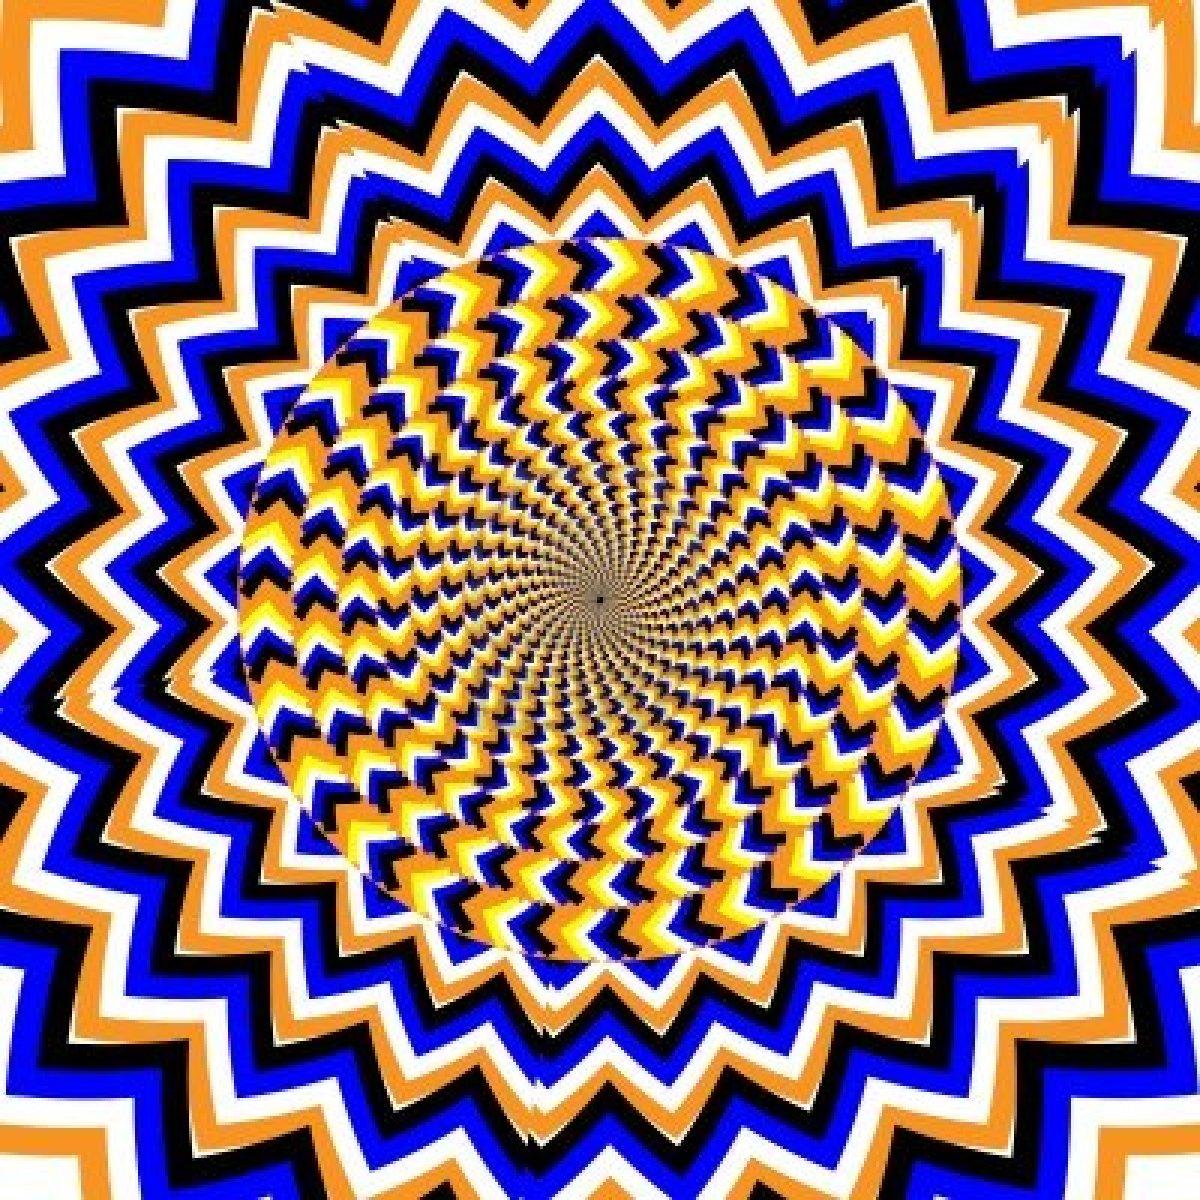 Photos illusion car moving optical illusion spectacular optical - Awesome Optical Illusion Wallpaper Wallpapersafari